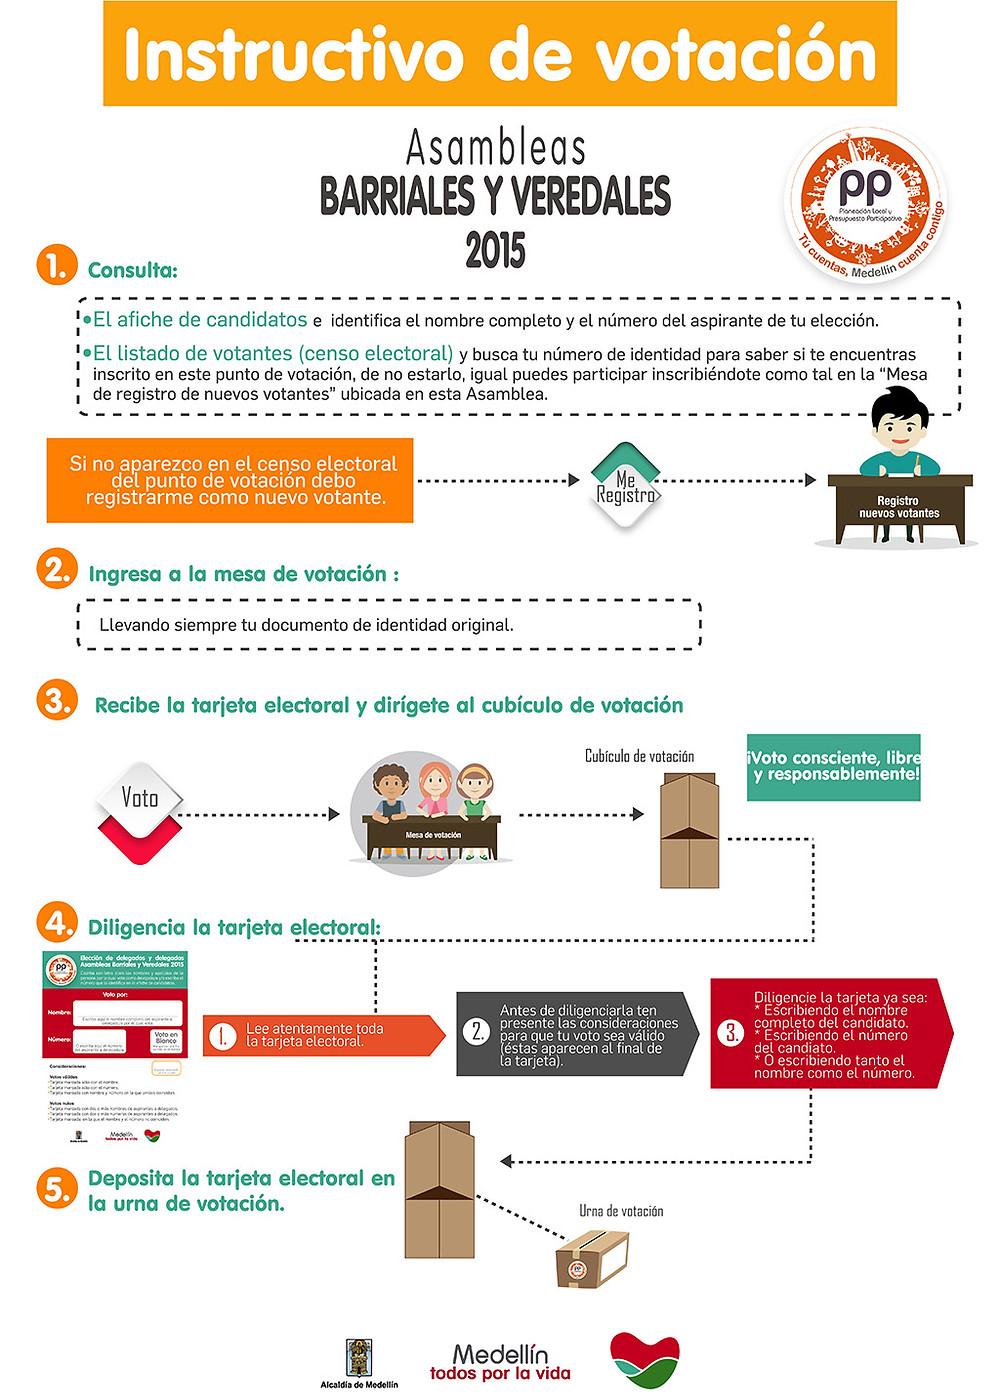 11_Votacion_PP_2015.jpg